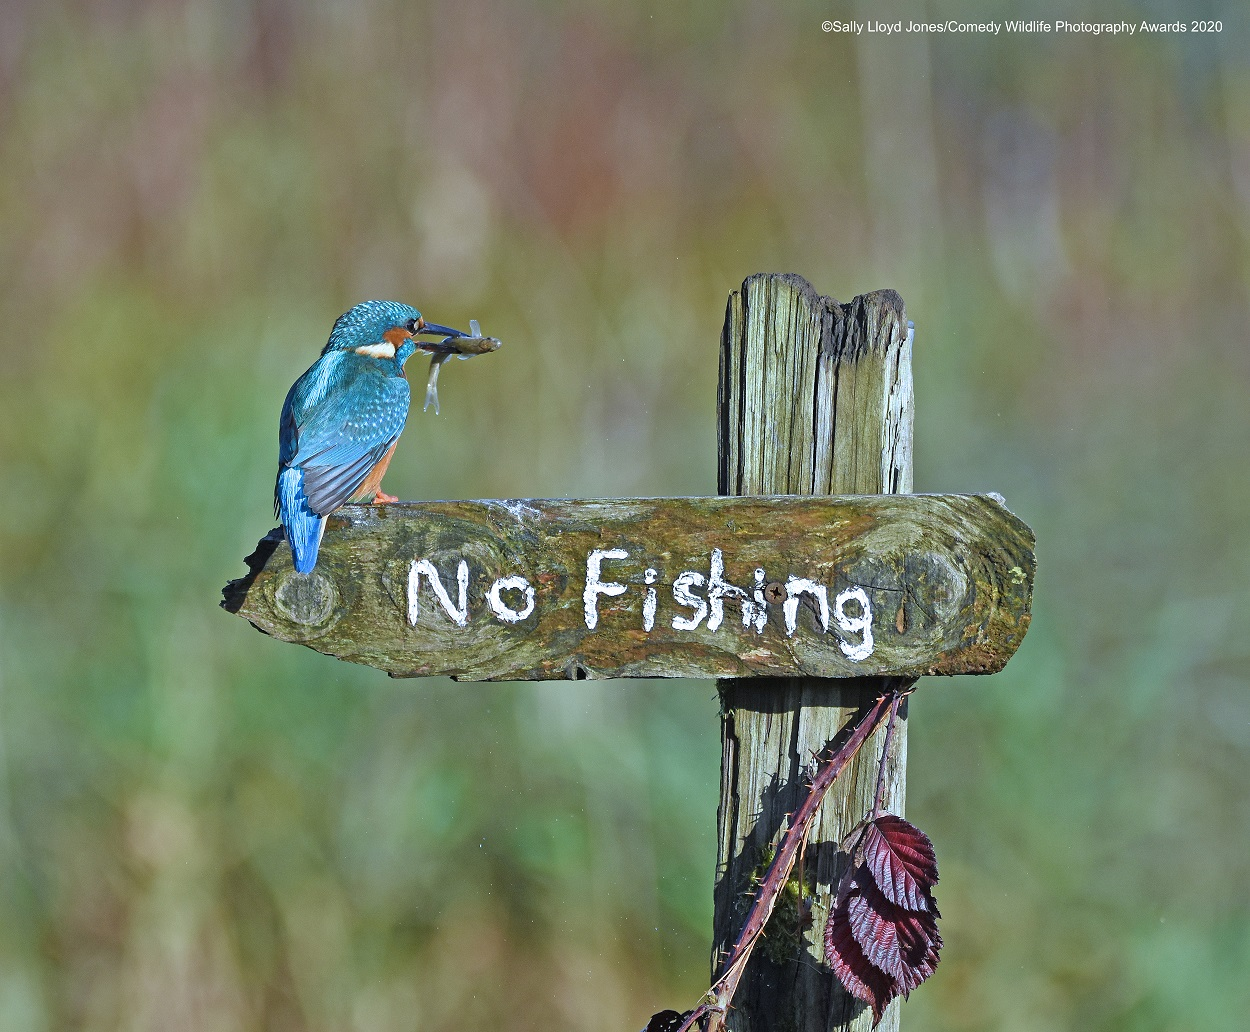 Sally-Lloyd-Jones_Its-A-Mocking-Bird_00001239.jpg